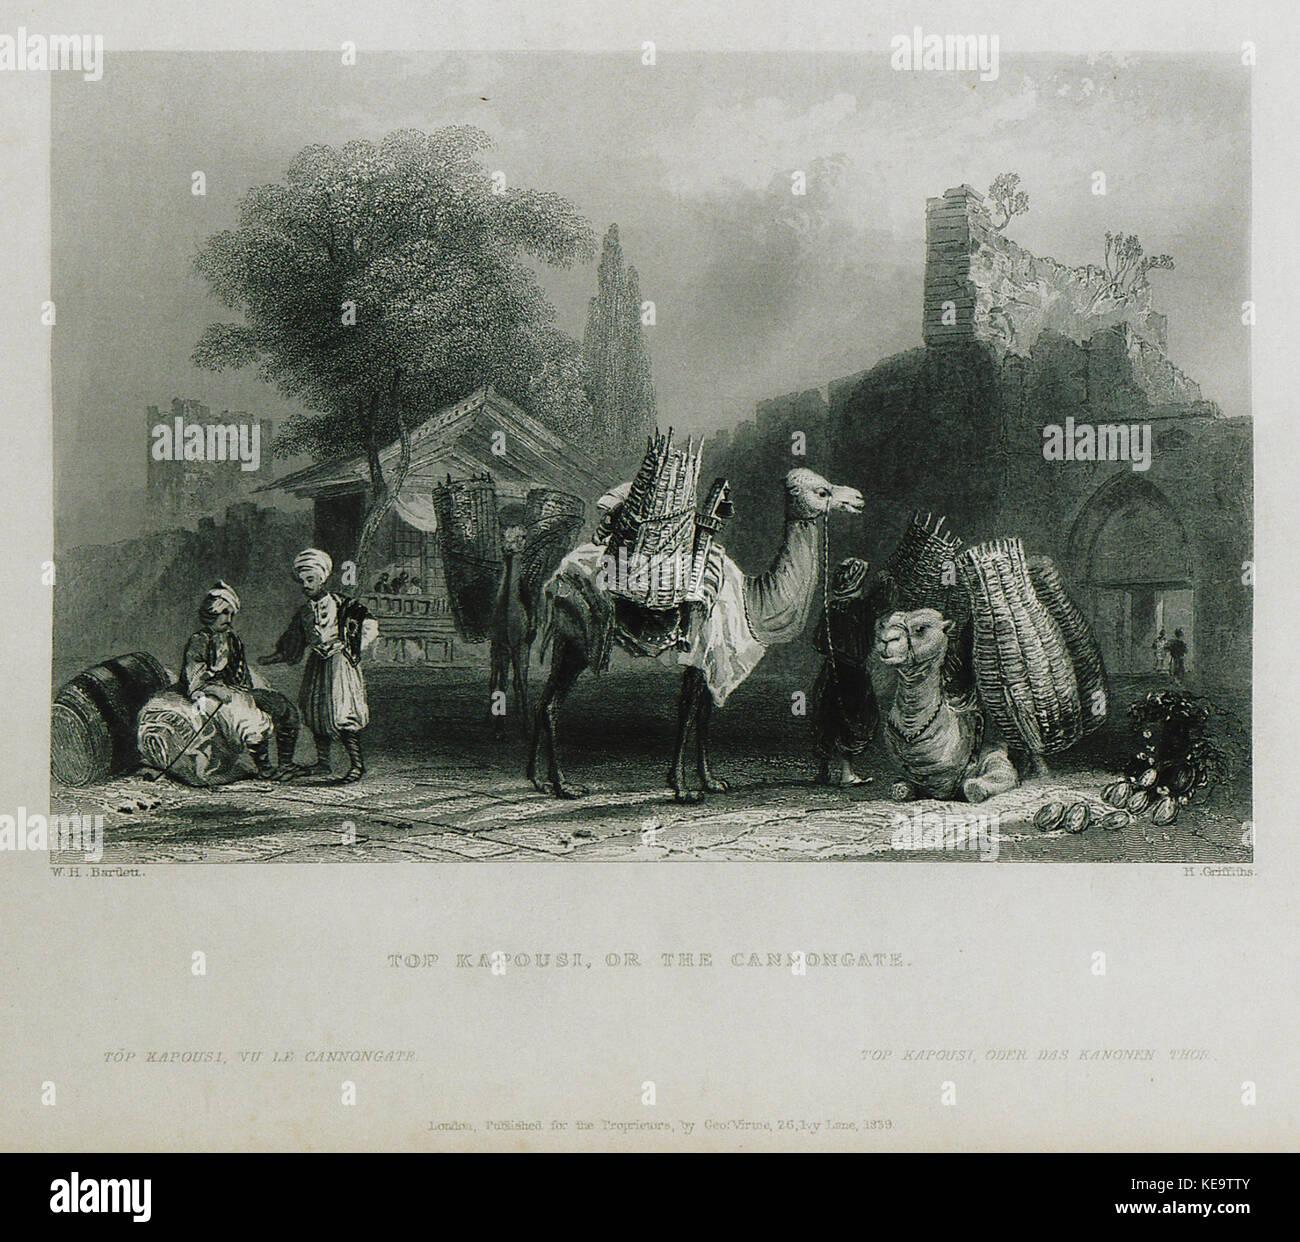 Top kapousi, or the Cannongate   Pardoe Julia   1838 Stock Photo